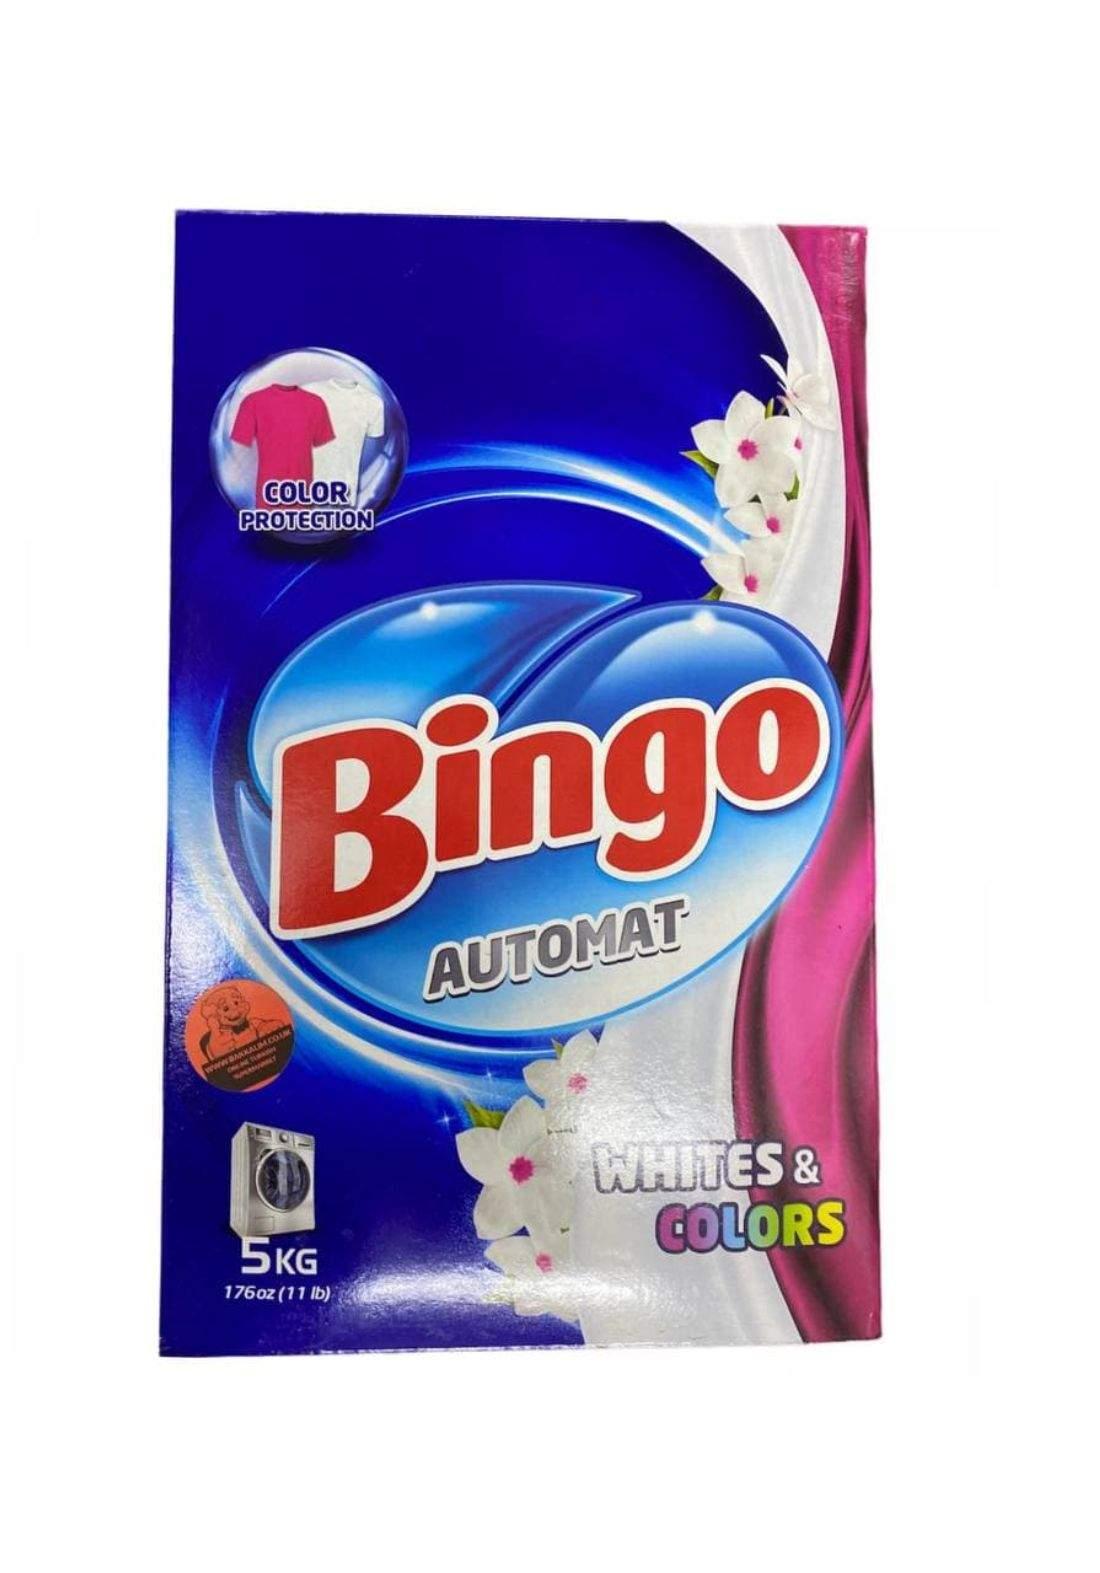 Bingo washing powder 5kg بينجو مسحوق غسيل